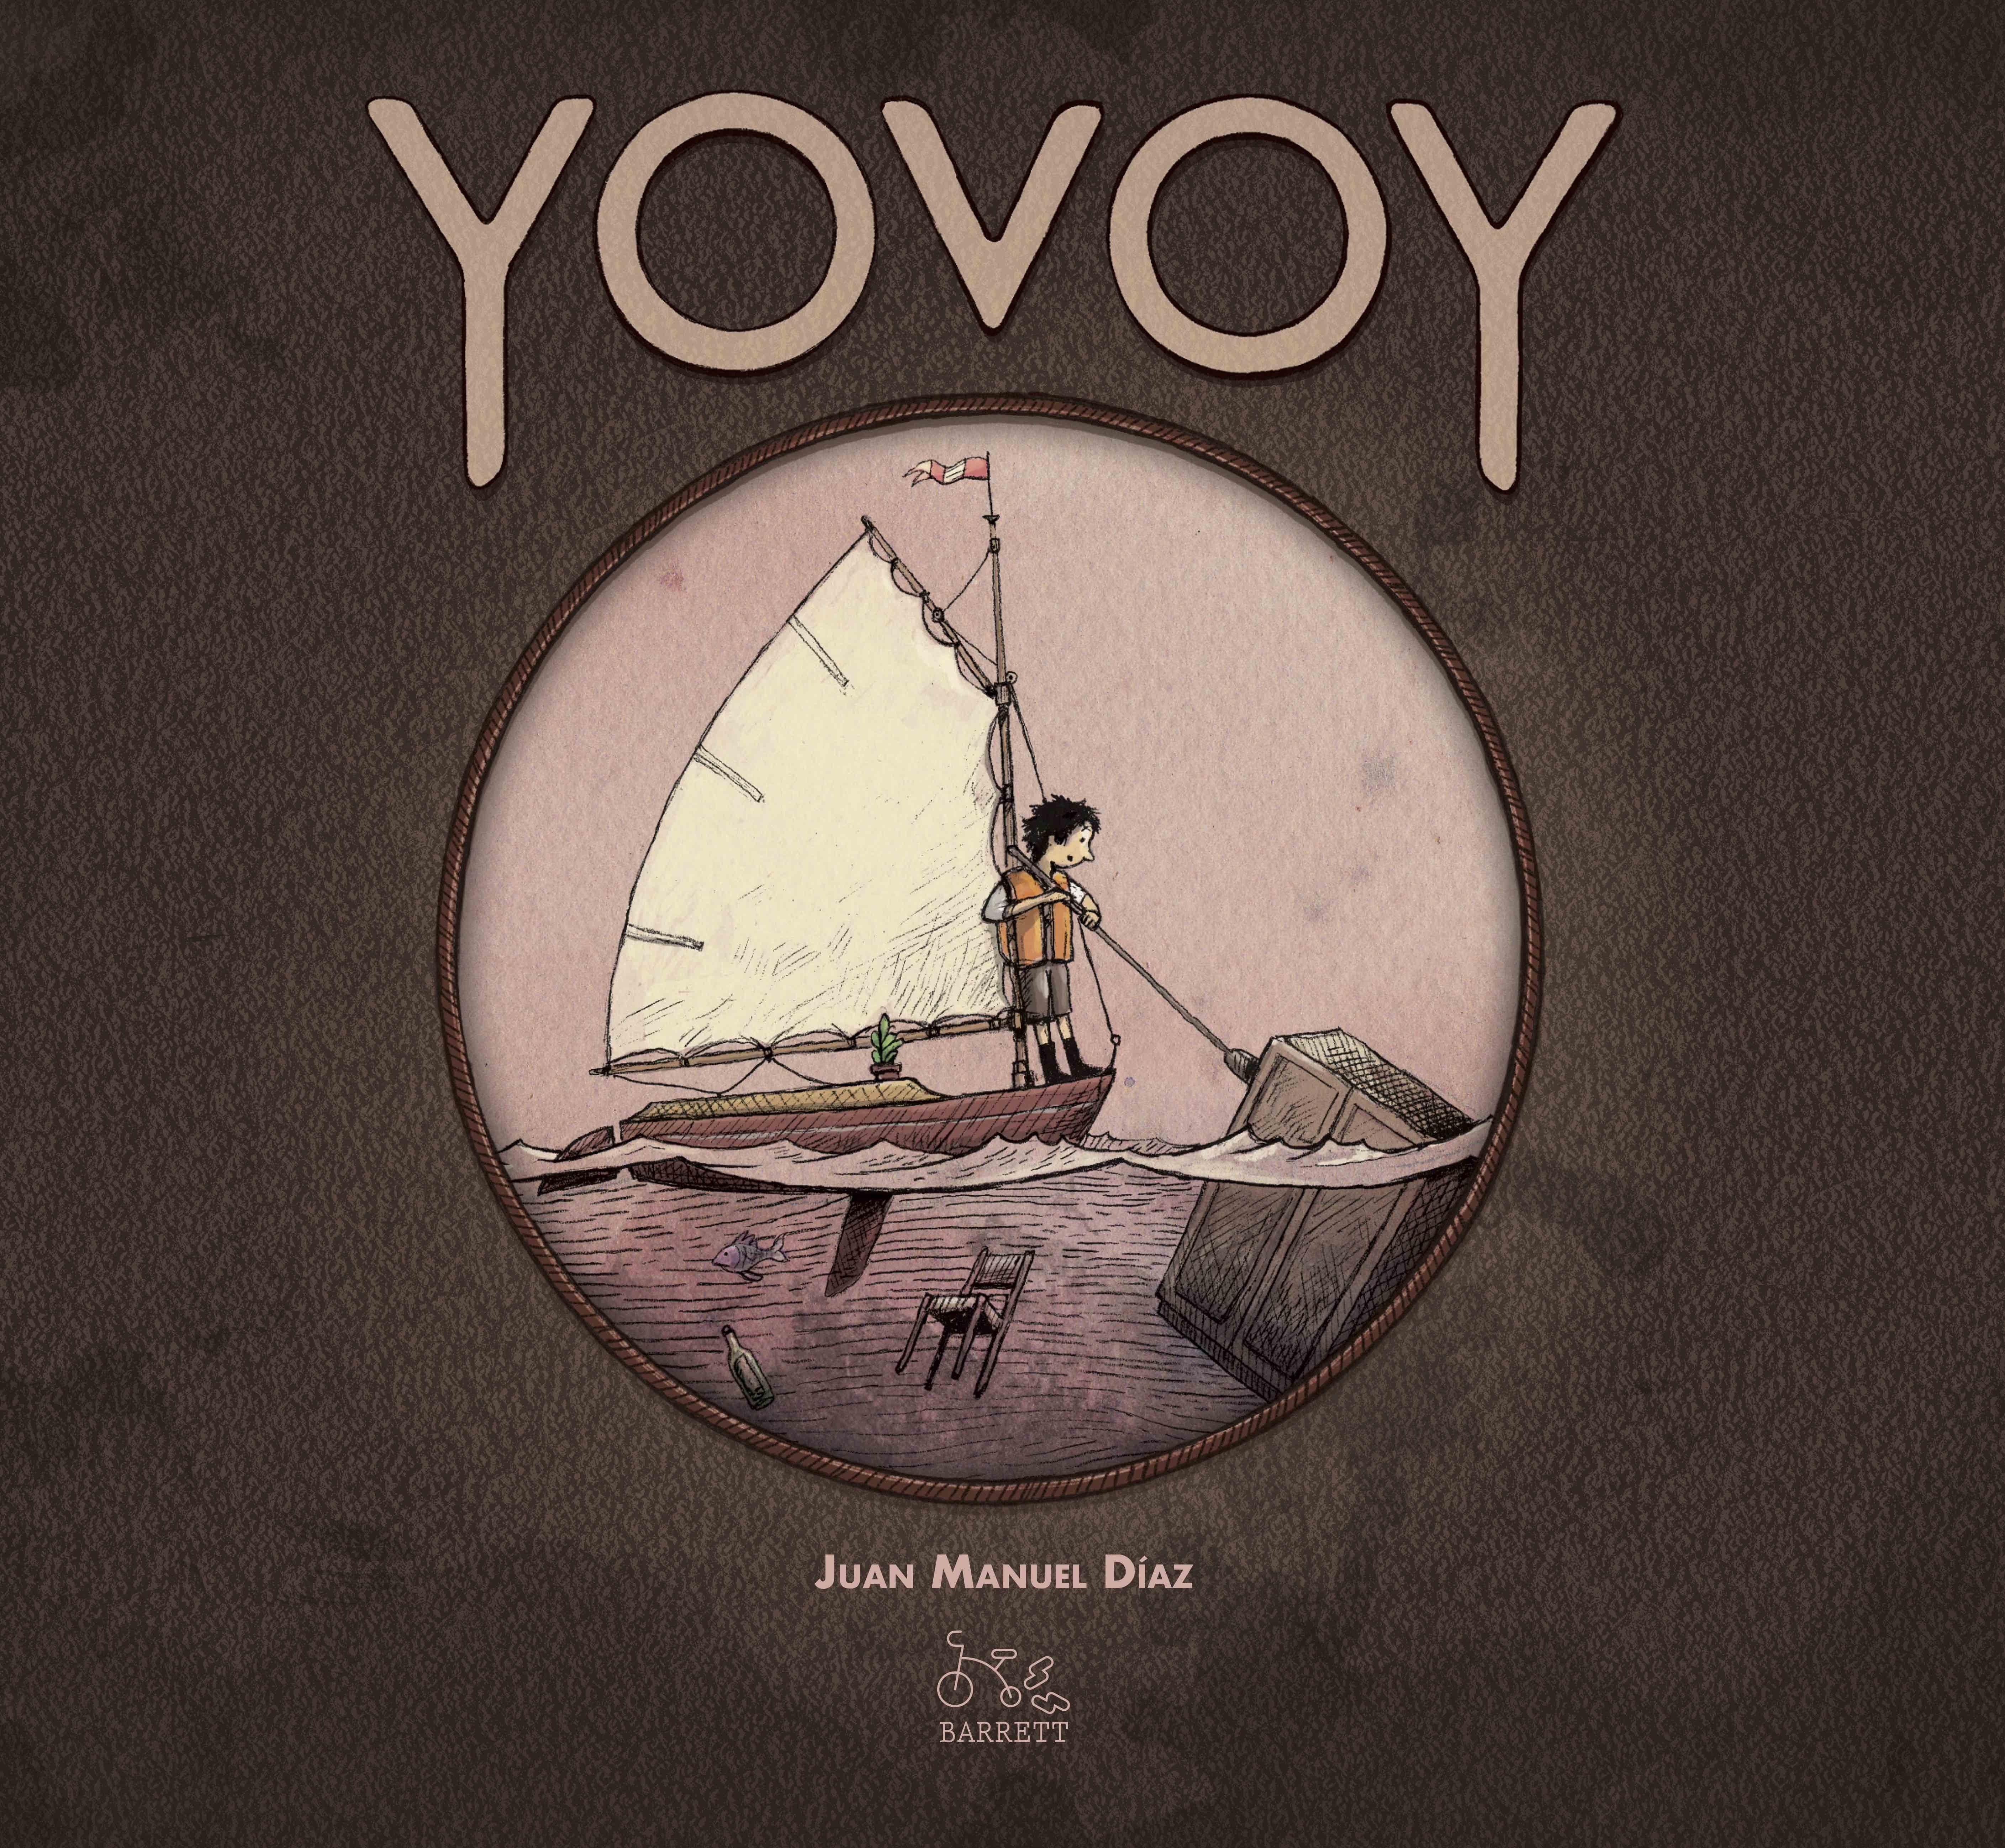 Yovoy por Juan Manuel Diaz